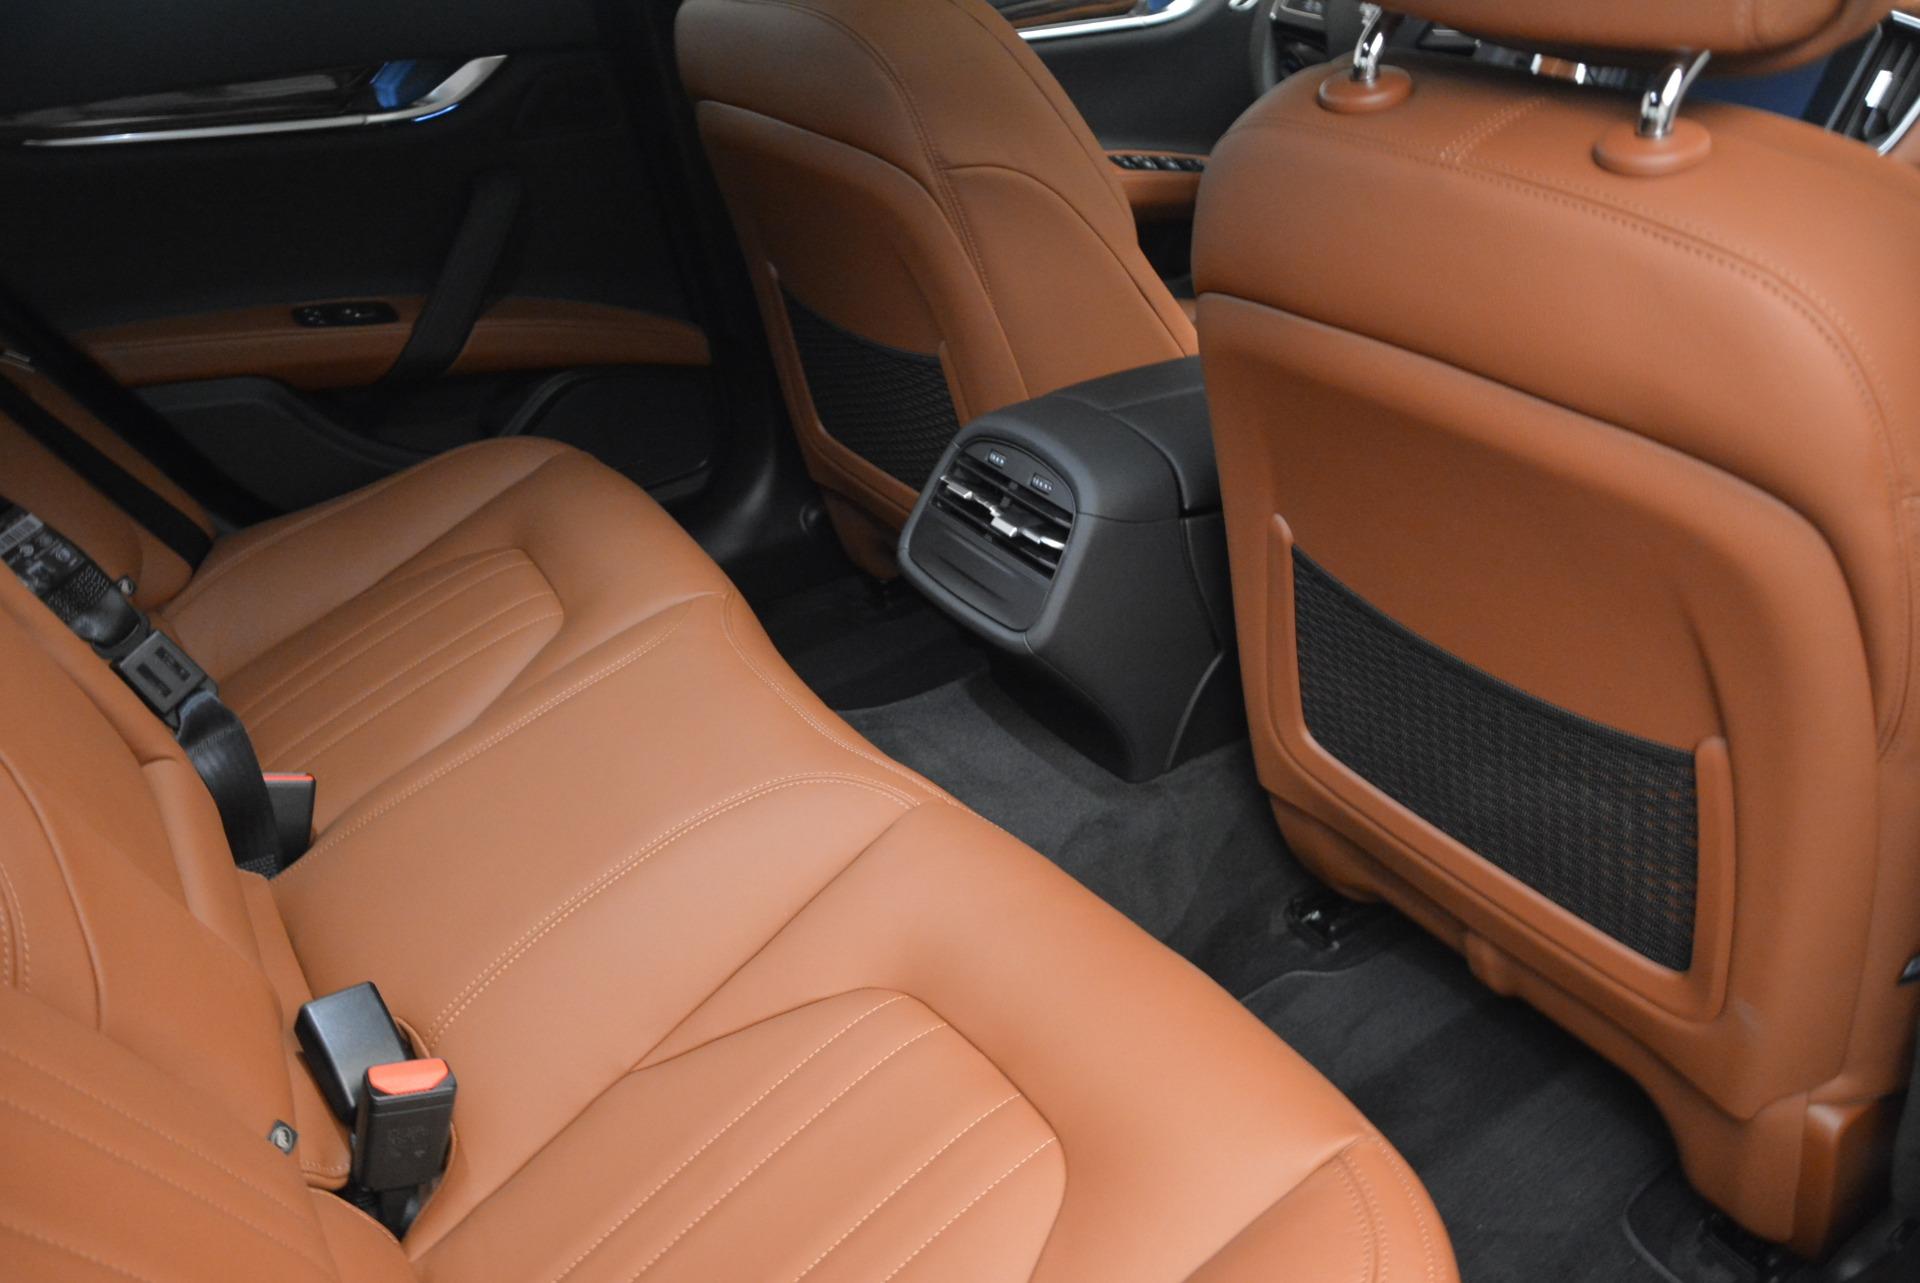 Used 2017 Maserati Ghibli S Q4 Ex-Loaner For Sale In Westport, CT 719_p23